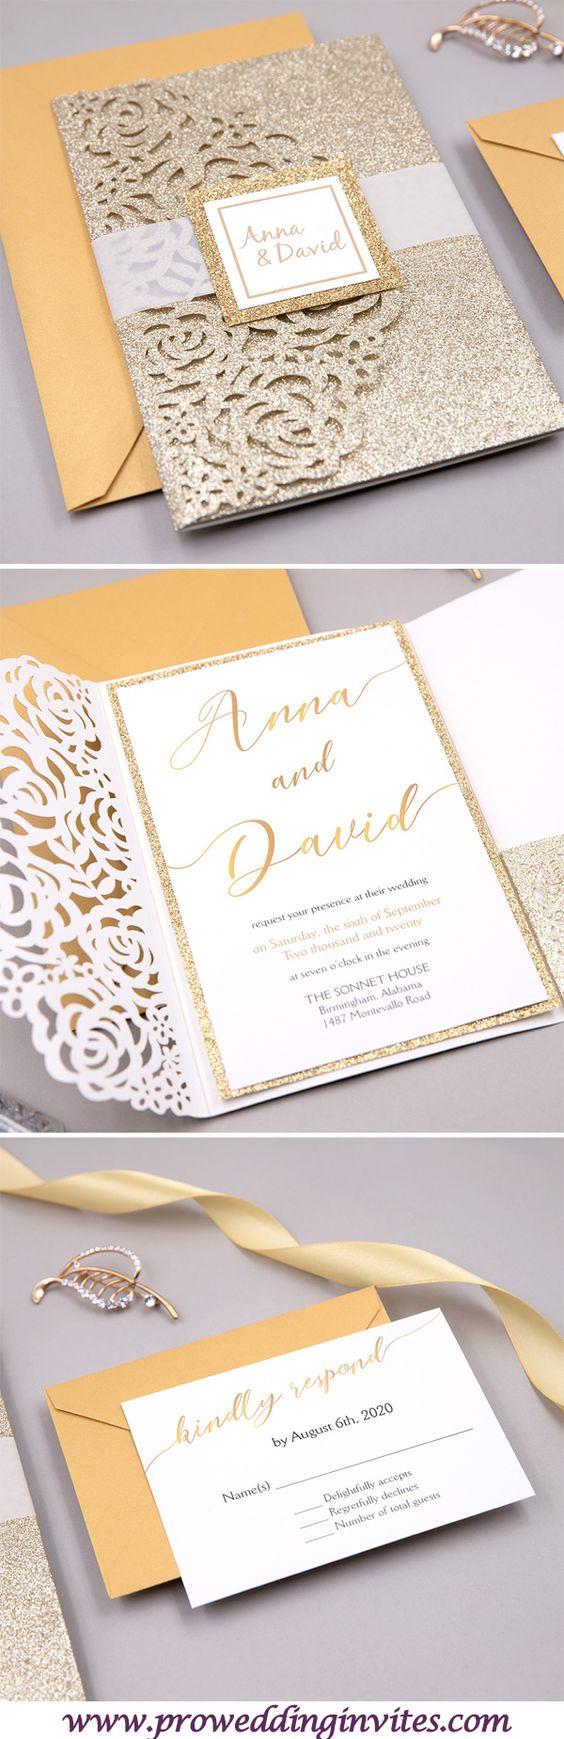 2021 Popular Wedding Invitation: Metallic Rose Gold Wedding